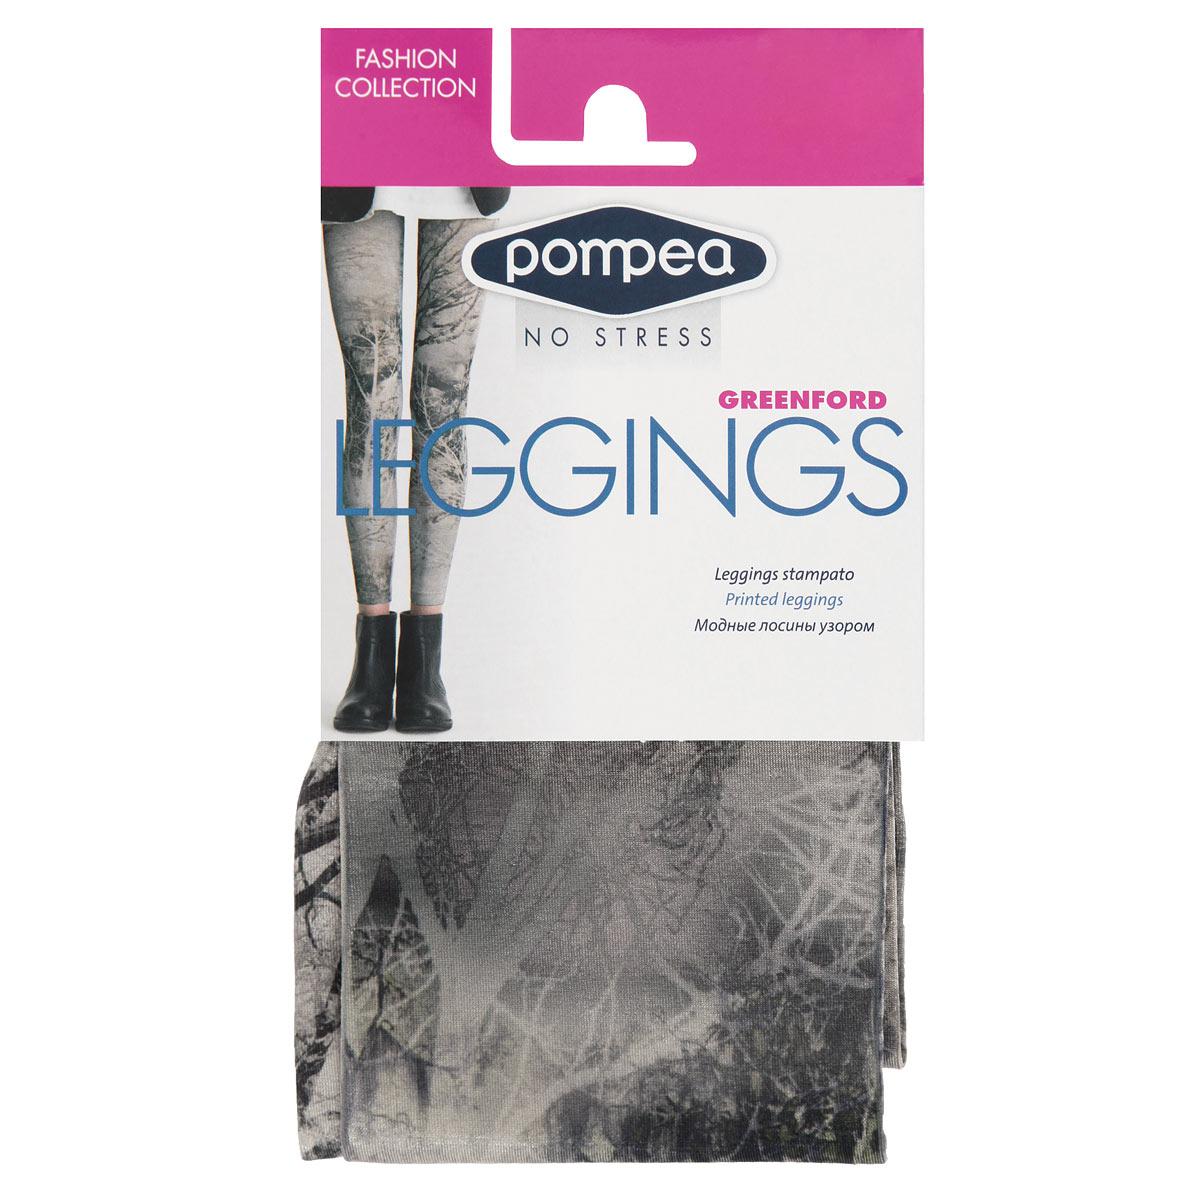 Леггинсы женские Pompea Leggings Greenford Fashion, цвет: Nature (природа). Размер 3-4 (3/4-M/L) lole леггинсы lsw1234 motion leggings m blue corn